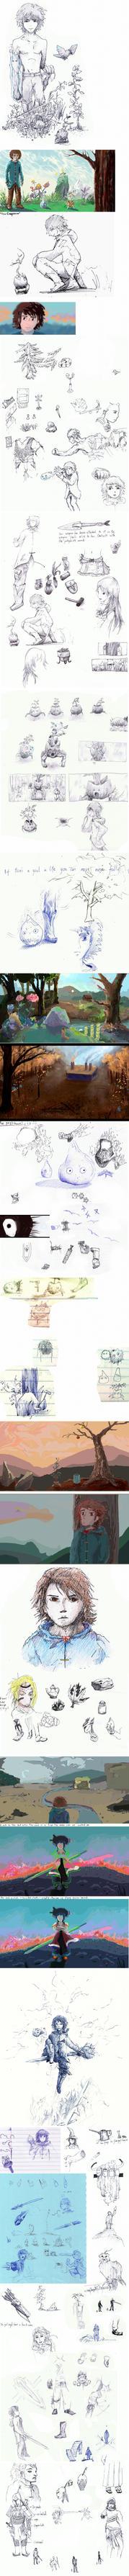 Concept Art Group 5. Air or Water by eltoNNNNNN